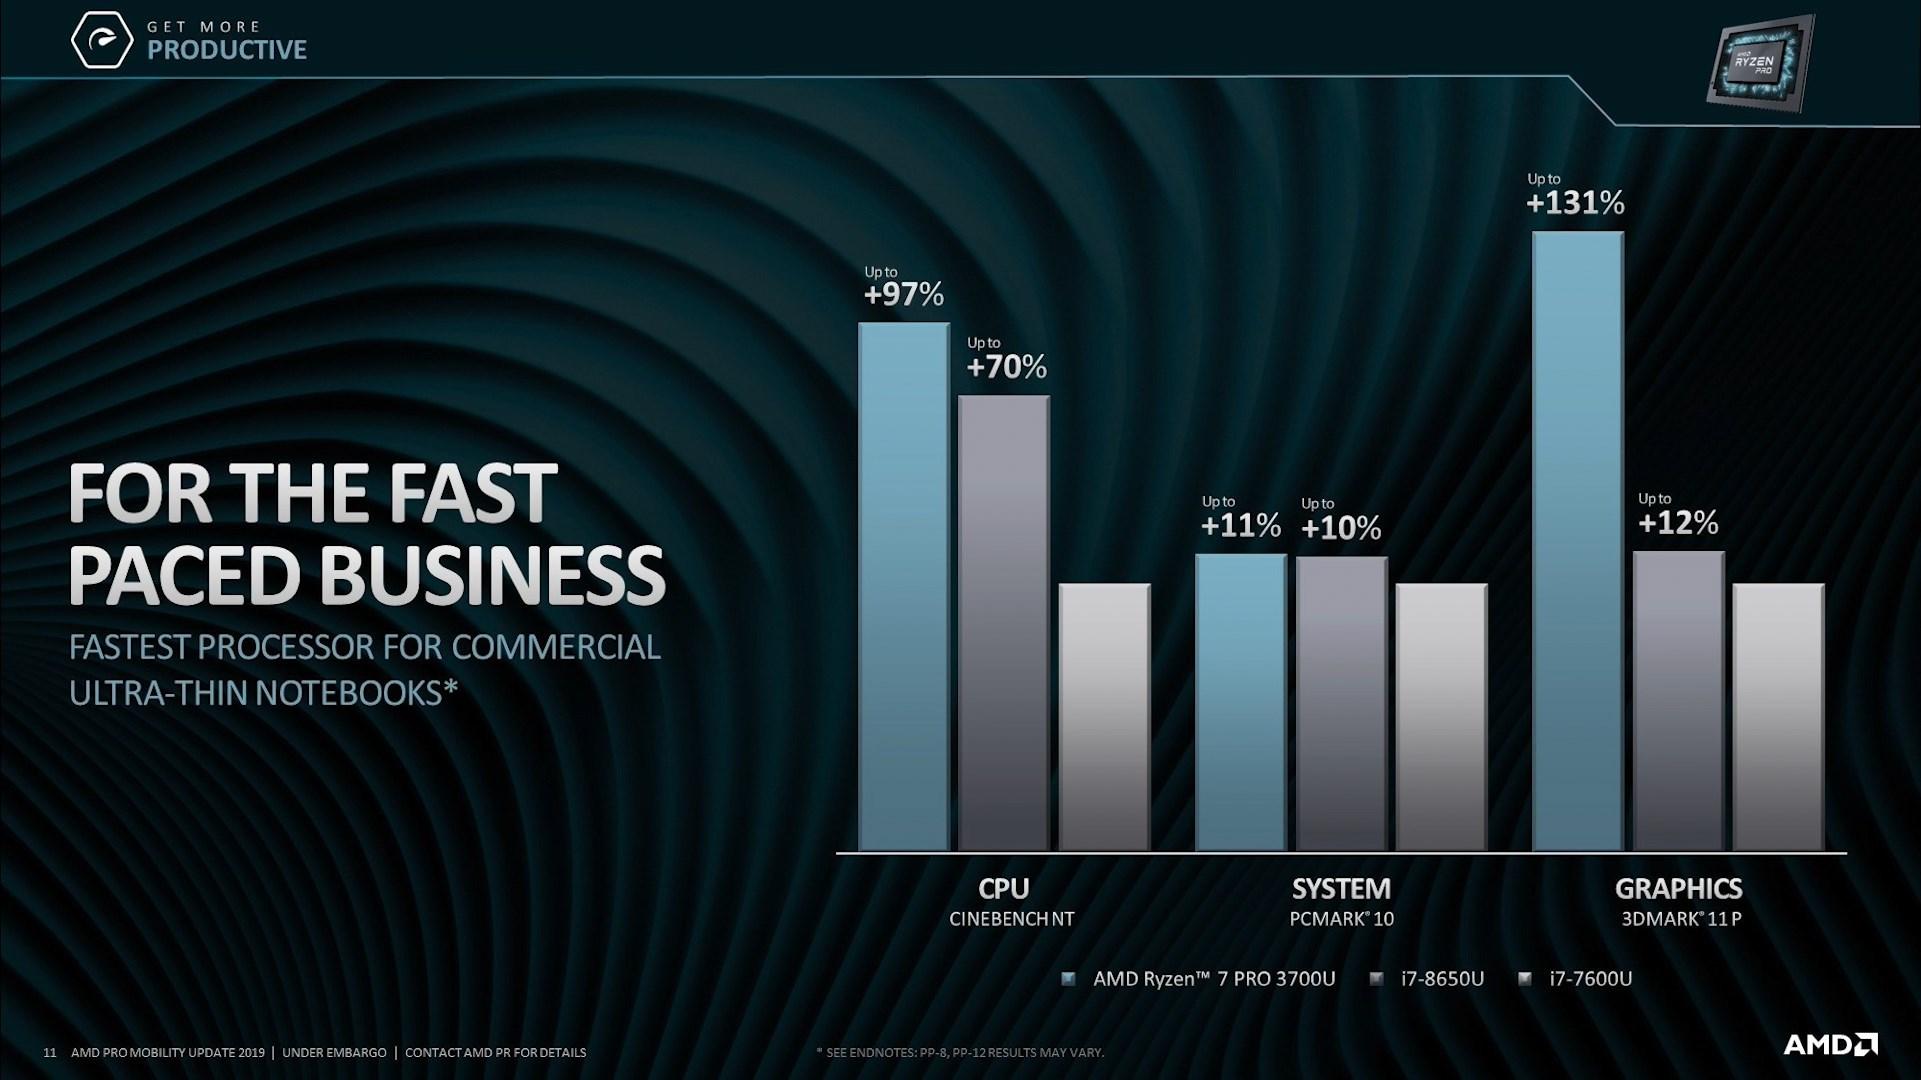 Сравнение производительности процессоров AMD Ryzen 7 Pro 3700U, Intel Core i7-8650U и Core i7-7600U